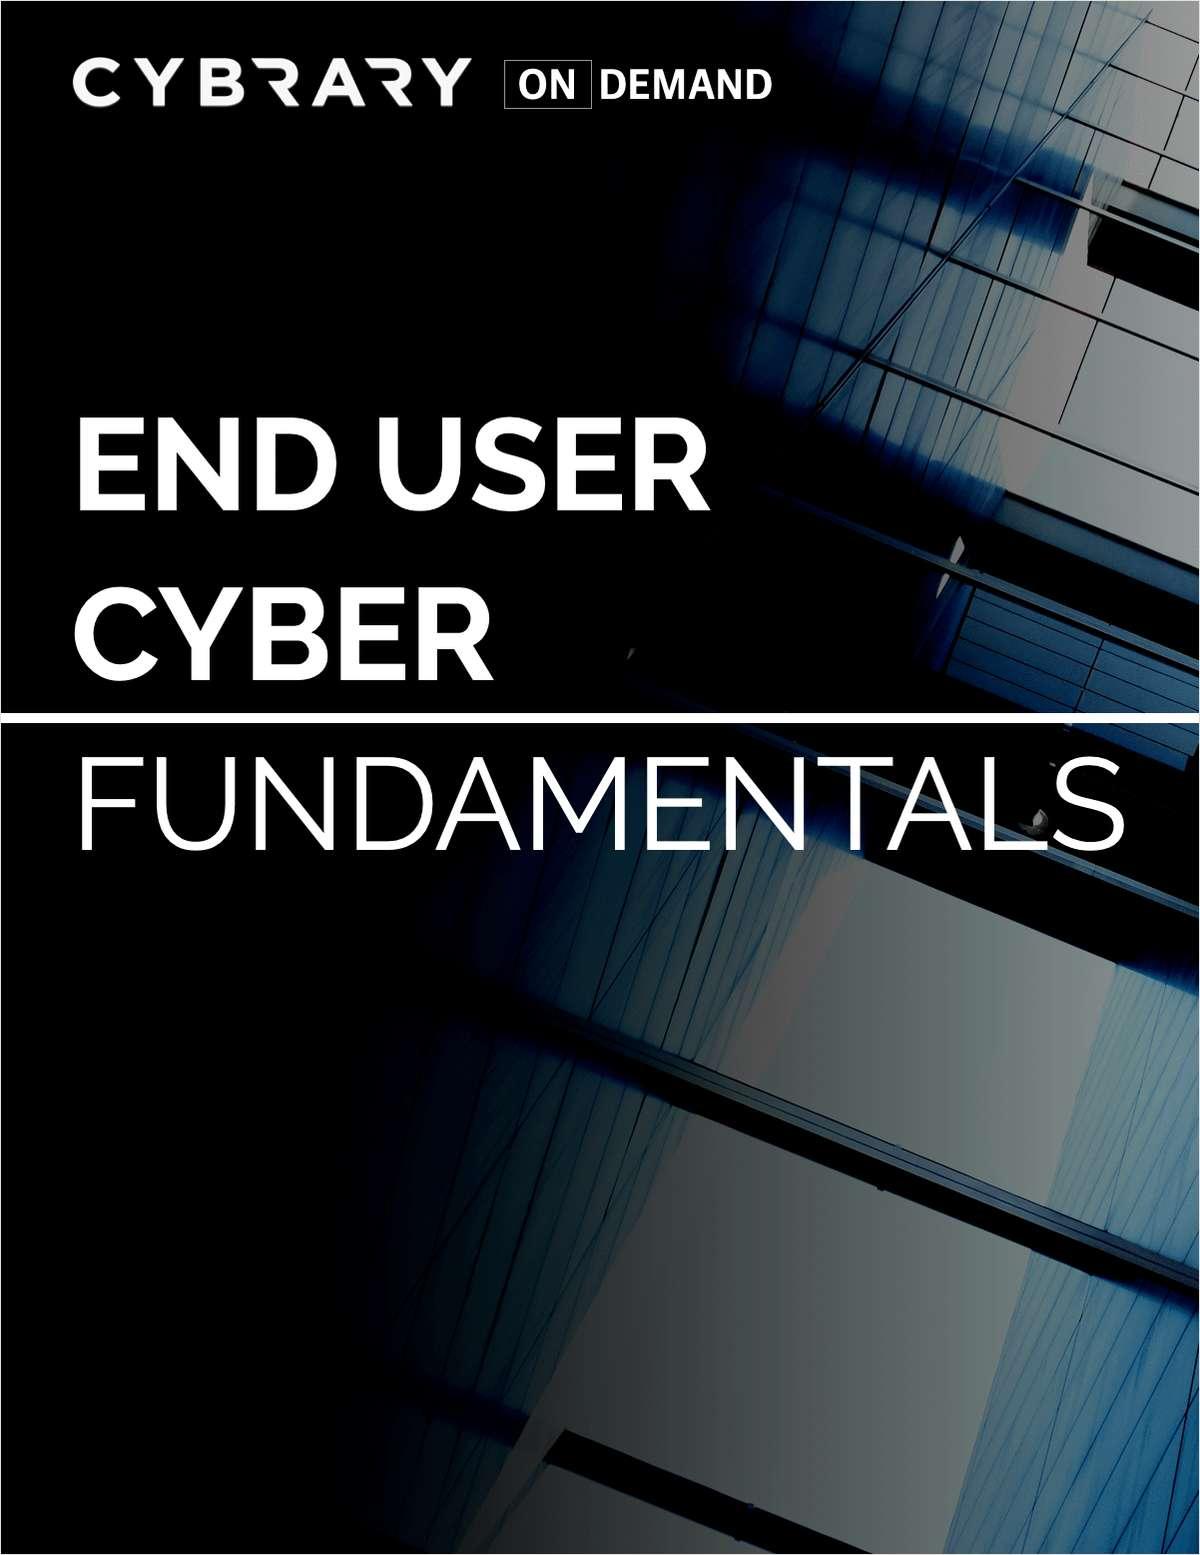 End User Cyber Fundamentals